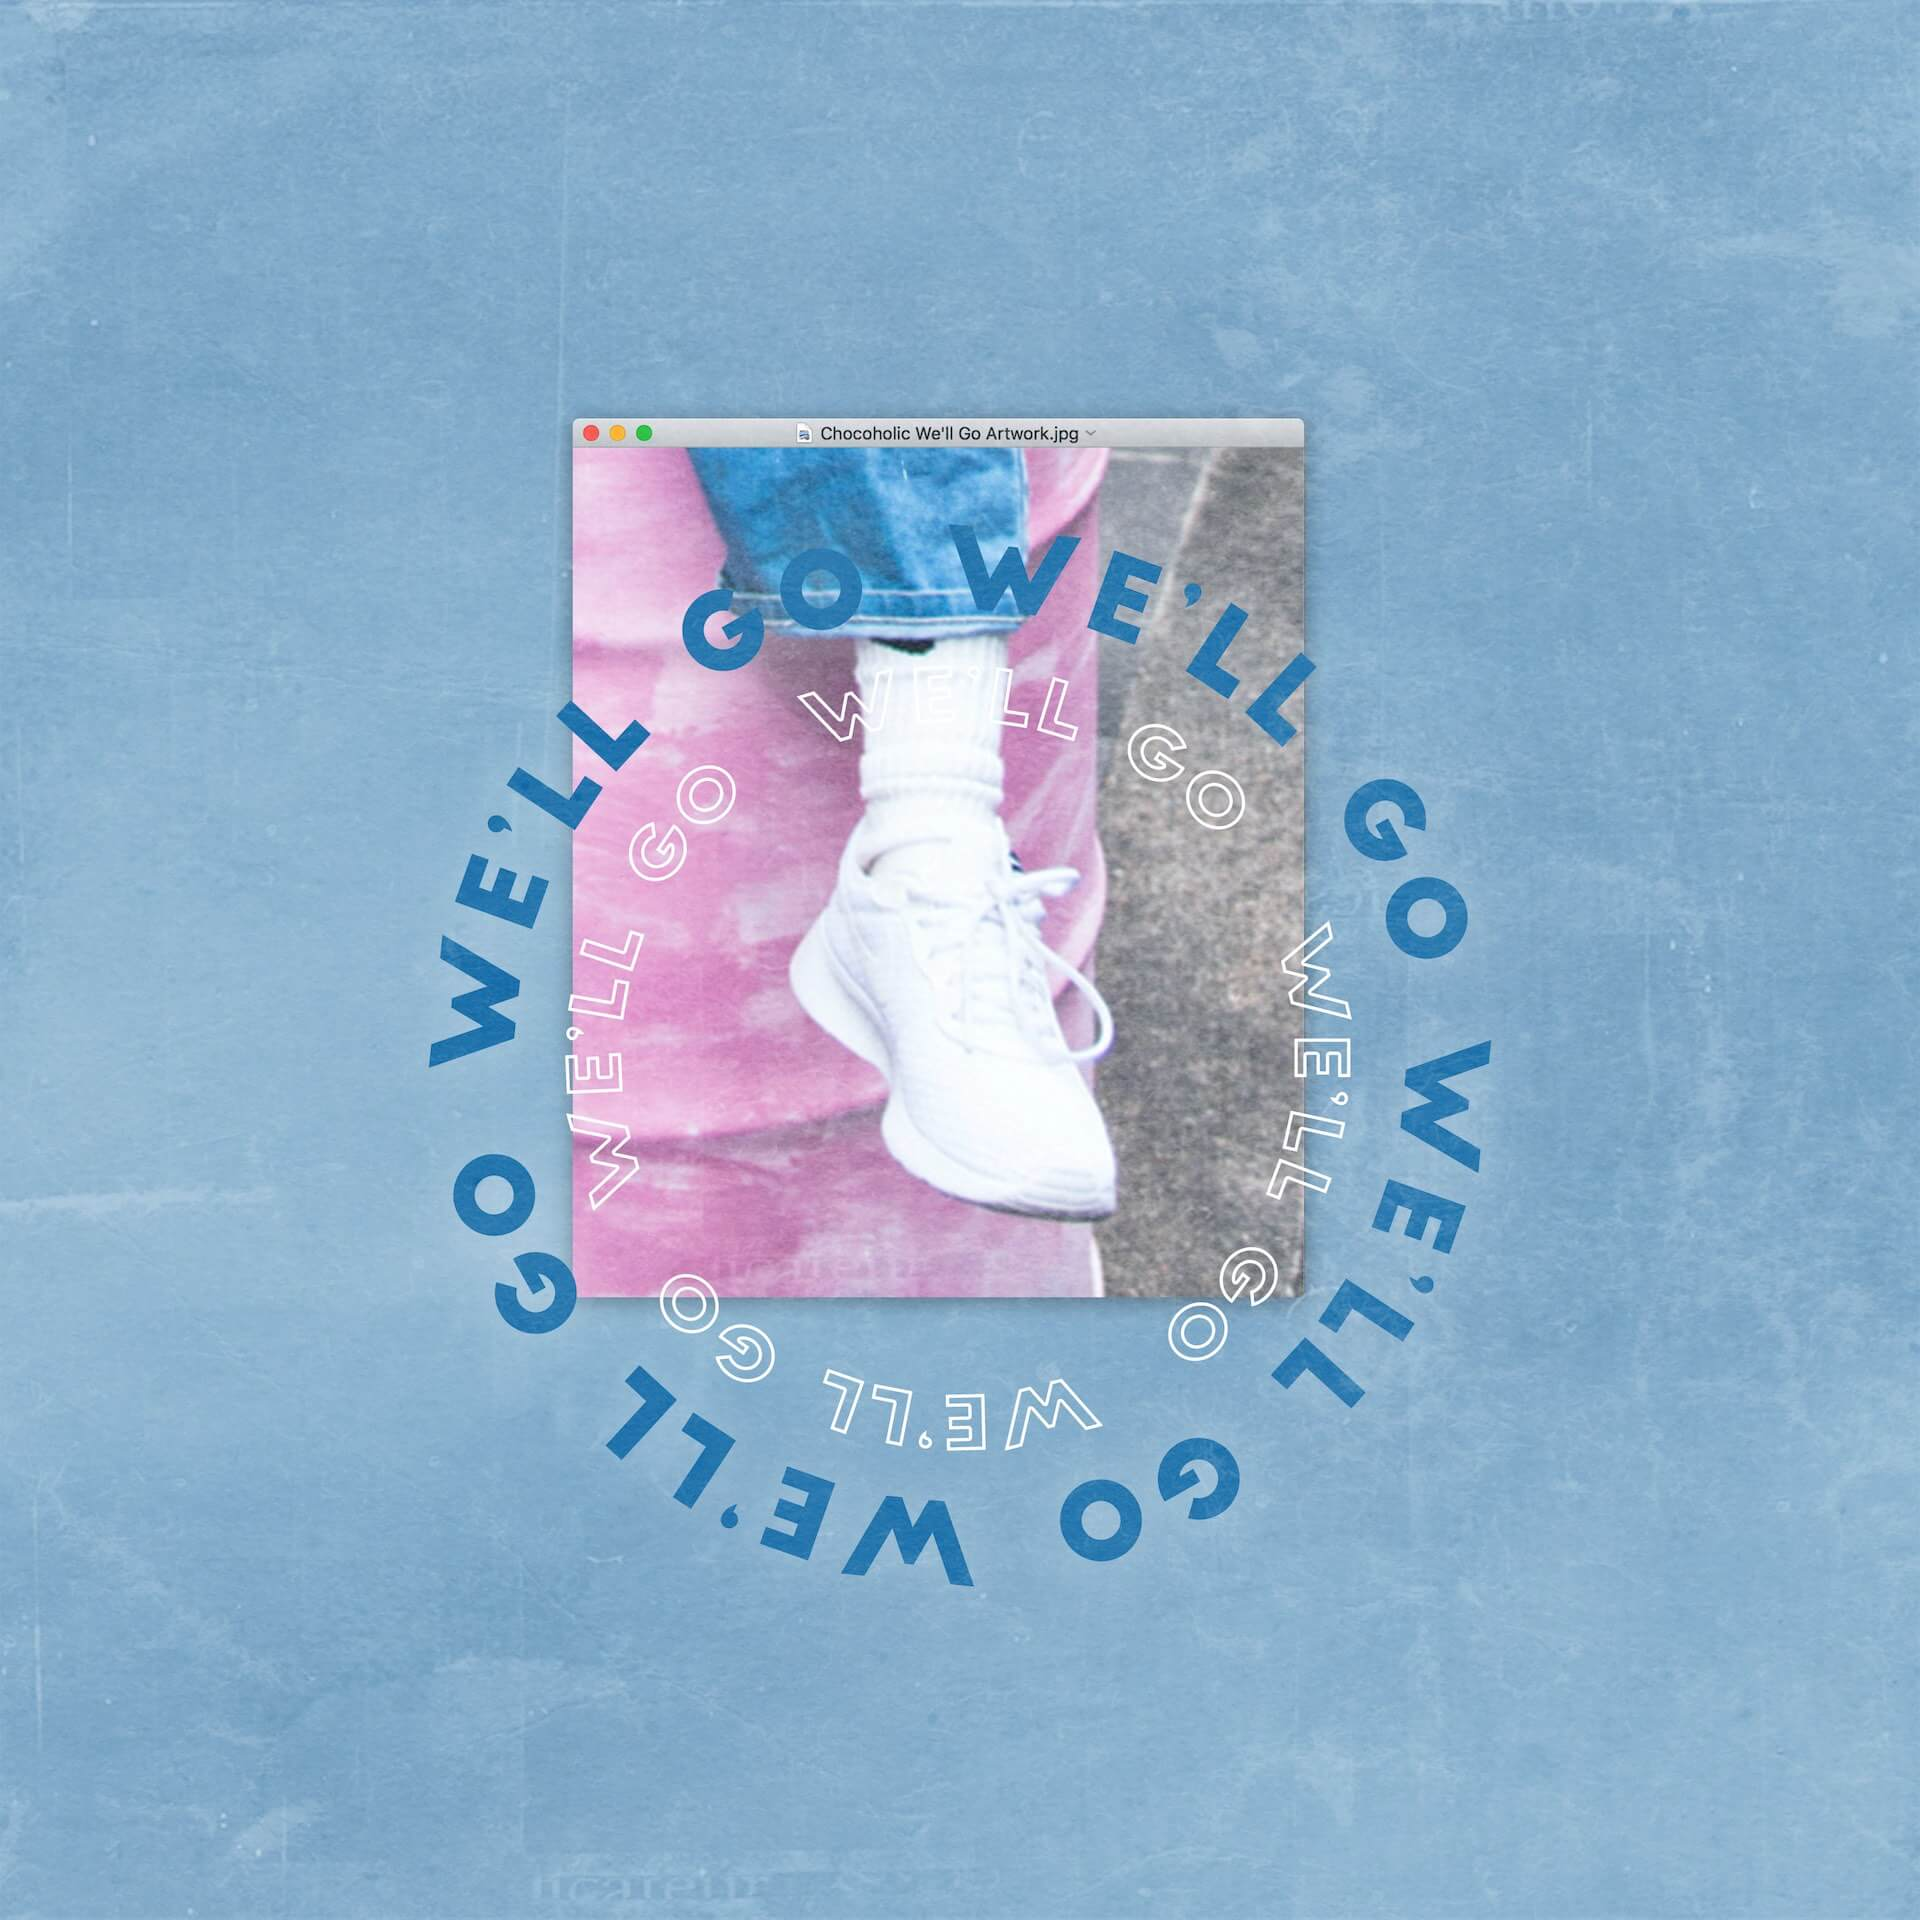 "Chocoholicが自身初の歌唱にチャレンジした新曲""We'll Go""をリリース!夏の恋模様を描いた美メロポップ music200708_chocoholic_02"